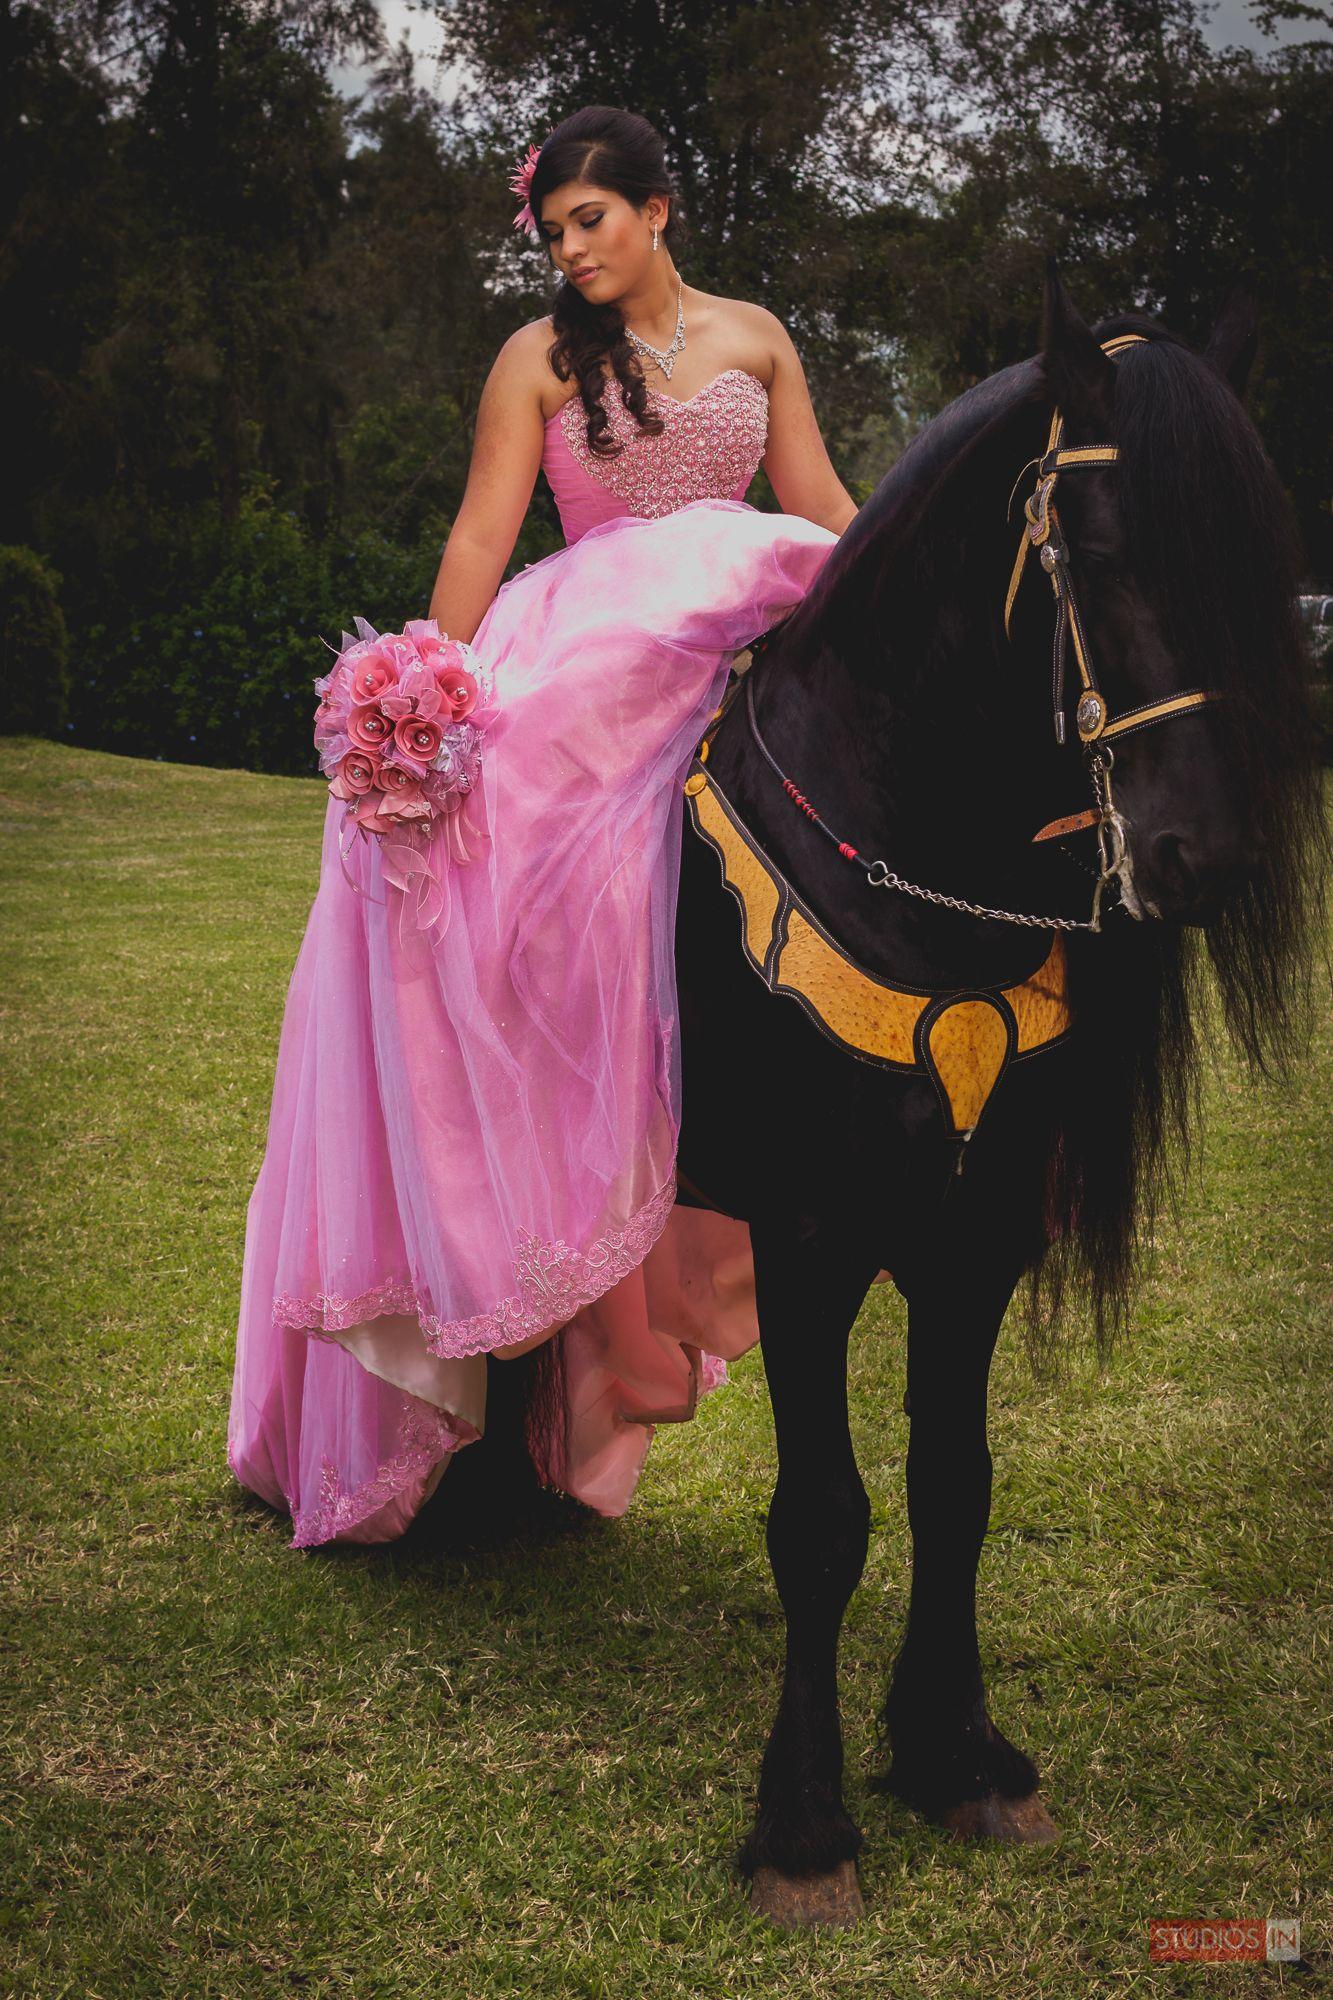 Gaby Diaz | sesion de Xv años con caballo - fotografia - ideas ...